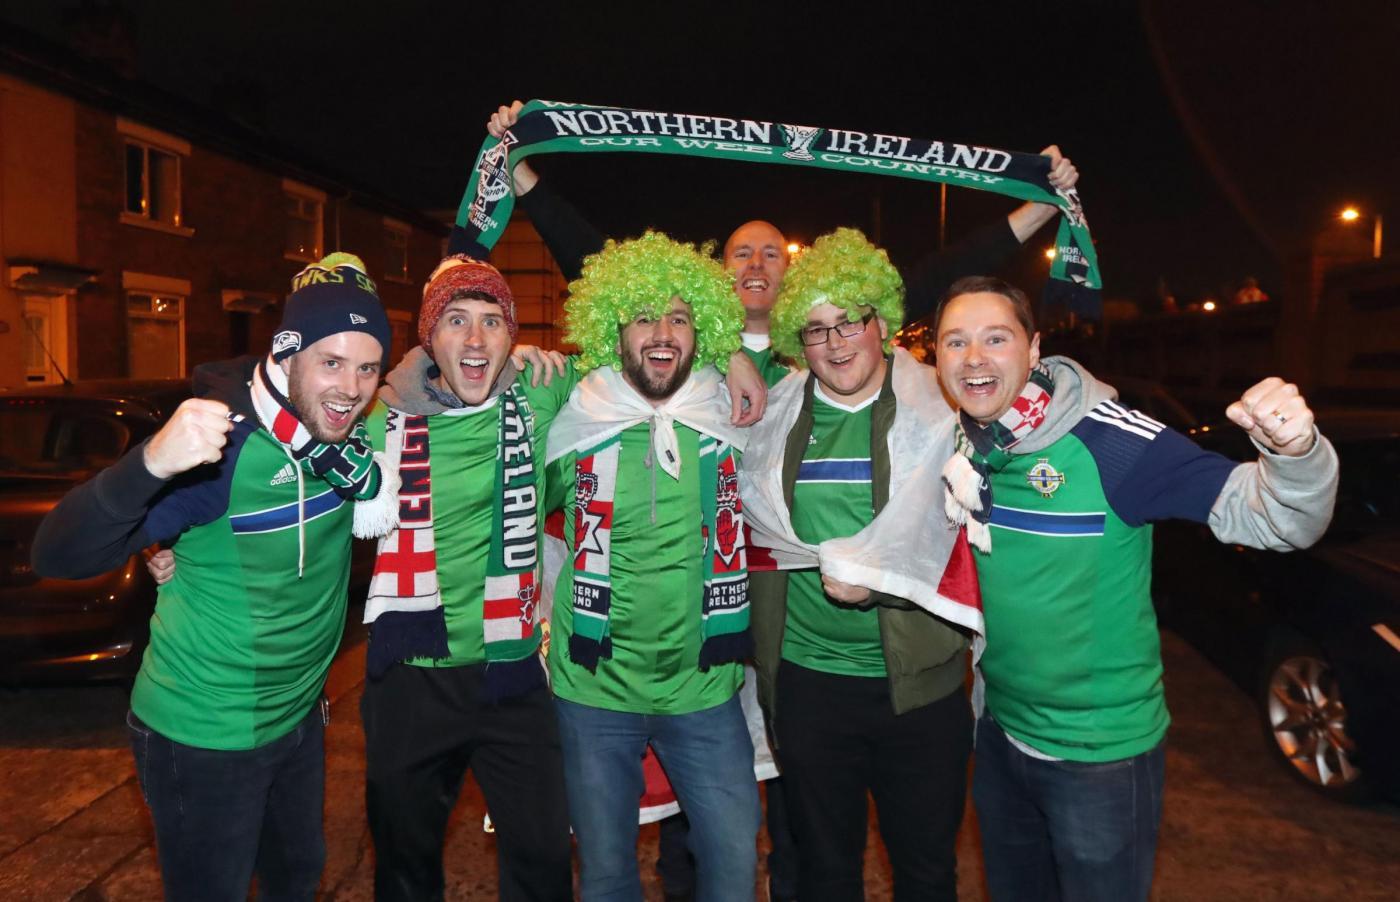 Irlanda del Nord Nifl Premiership pronostici: 4 gare in programma